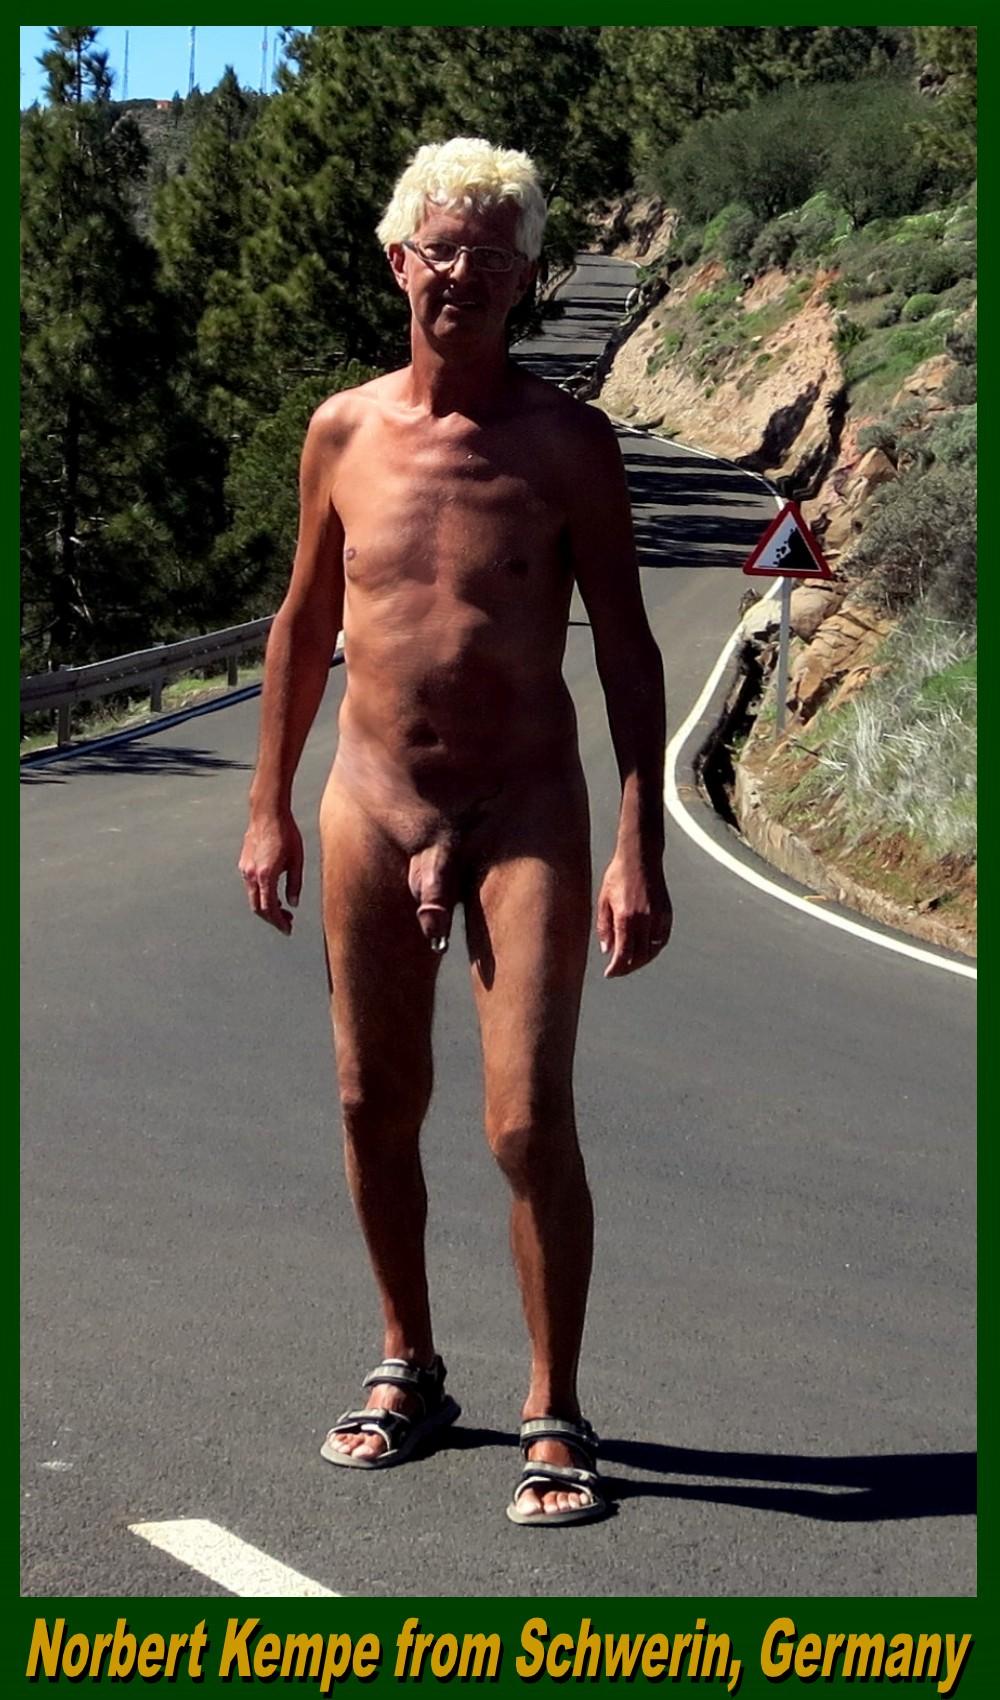 Norbert Kempe fully naked